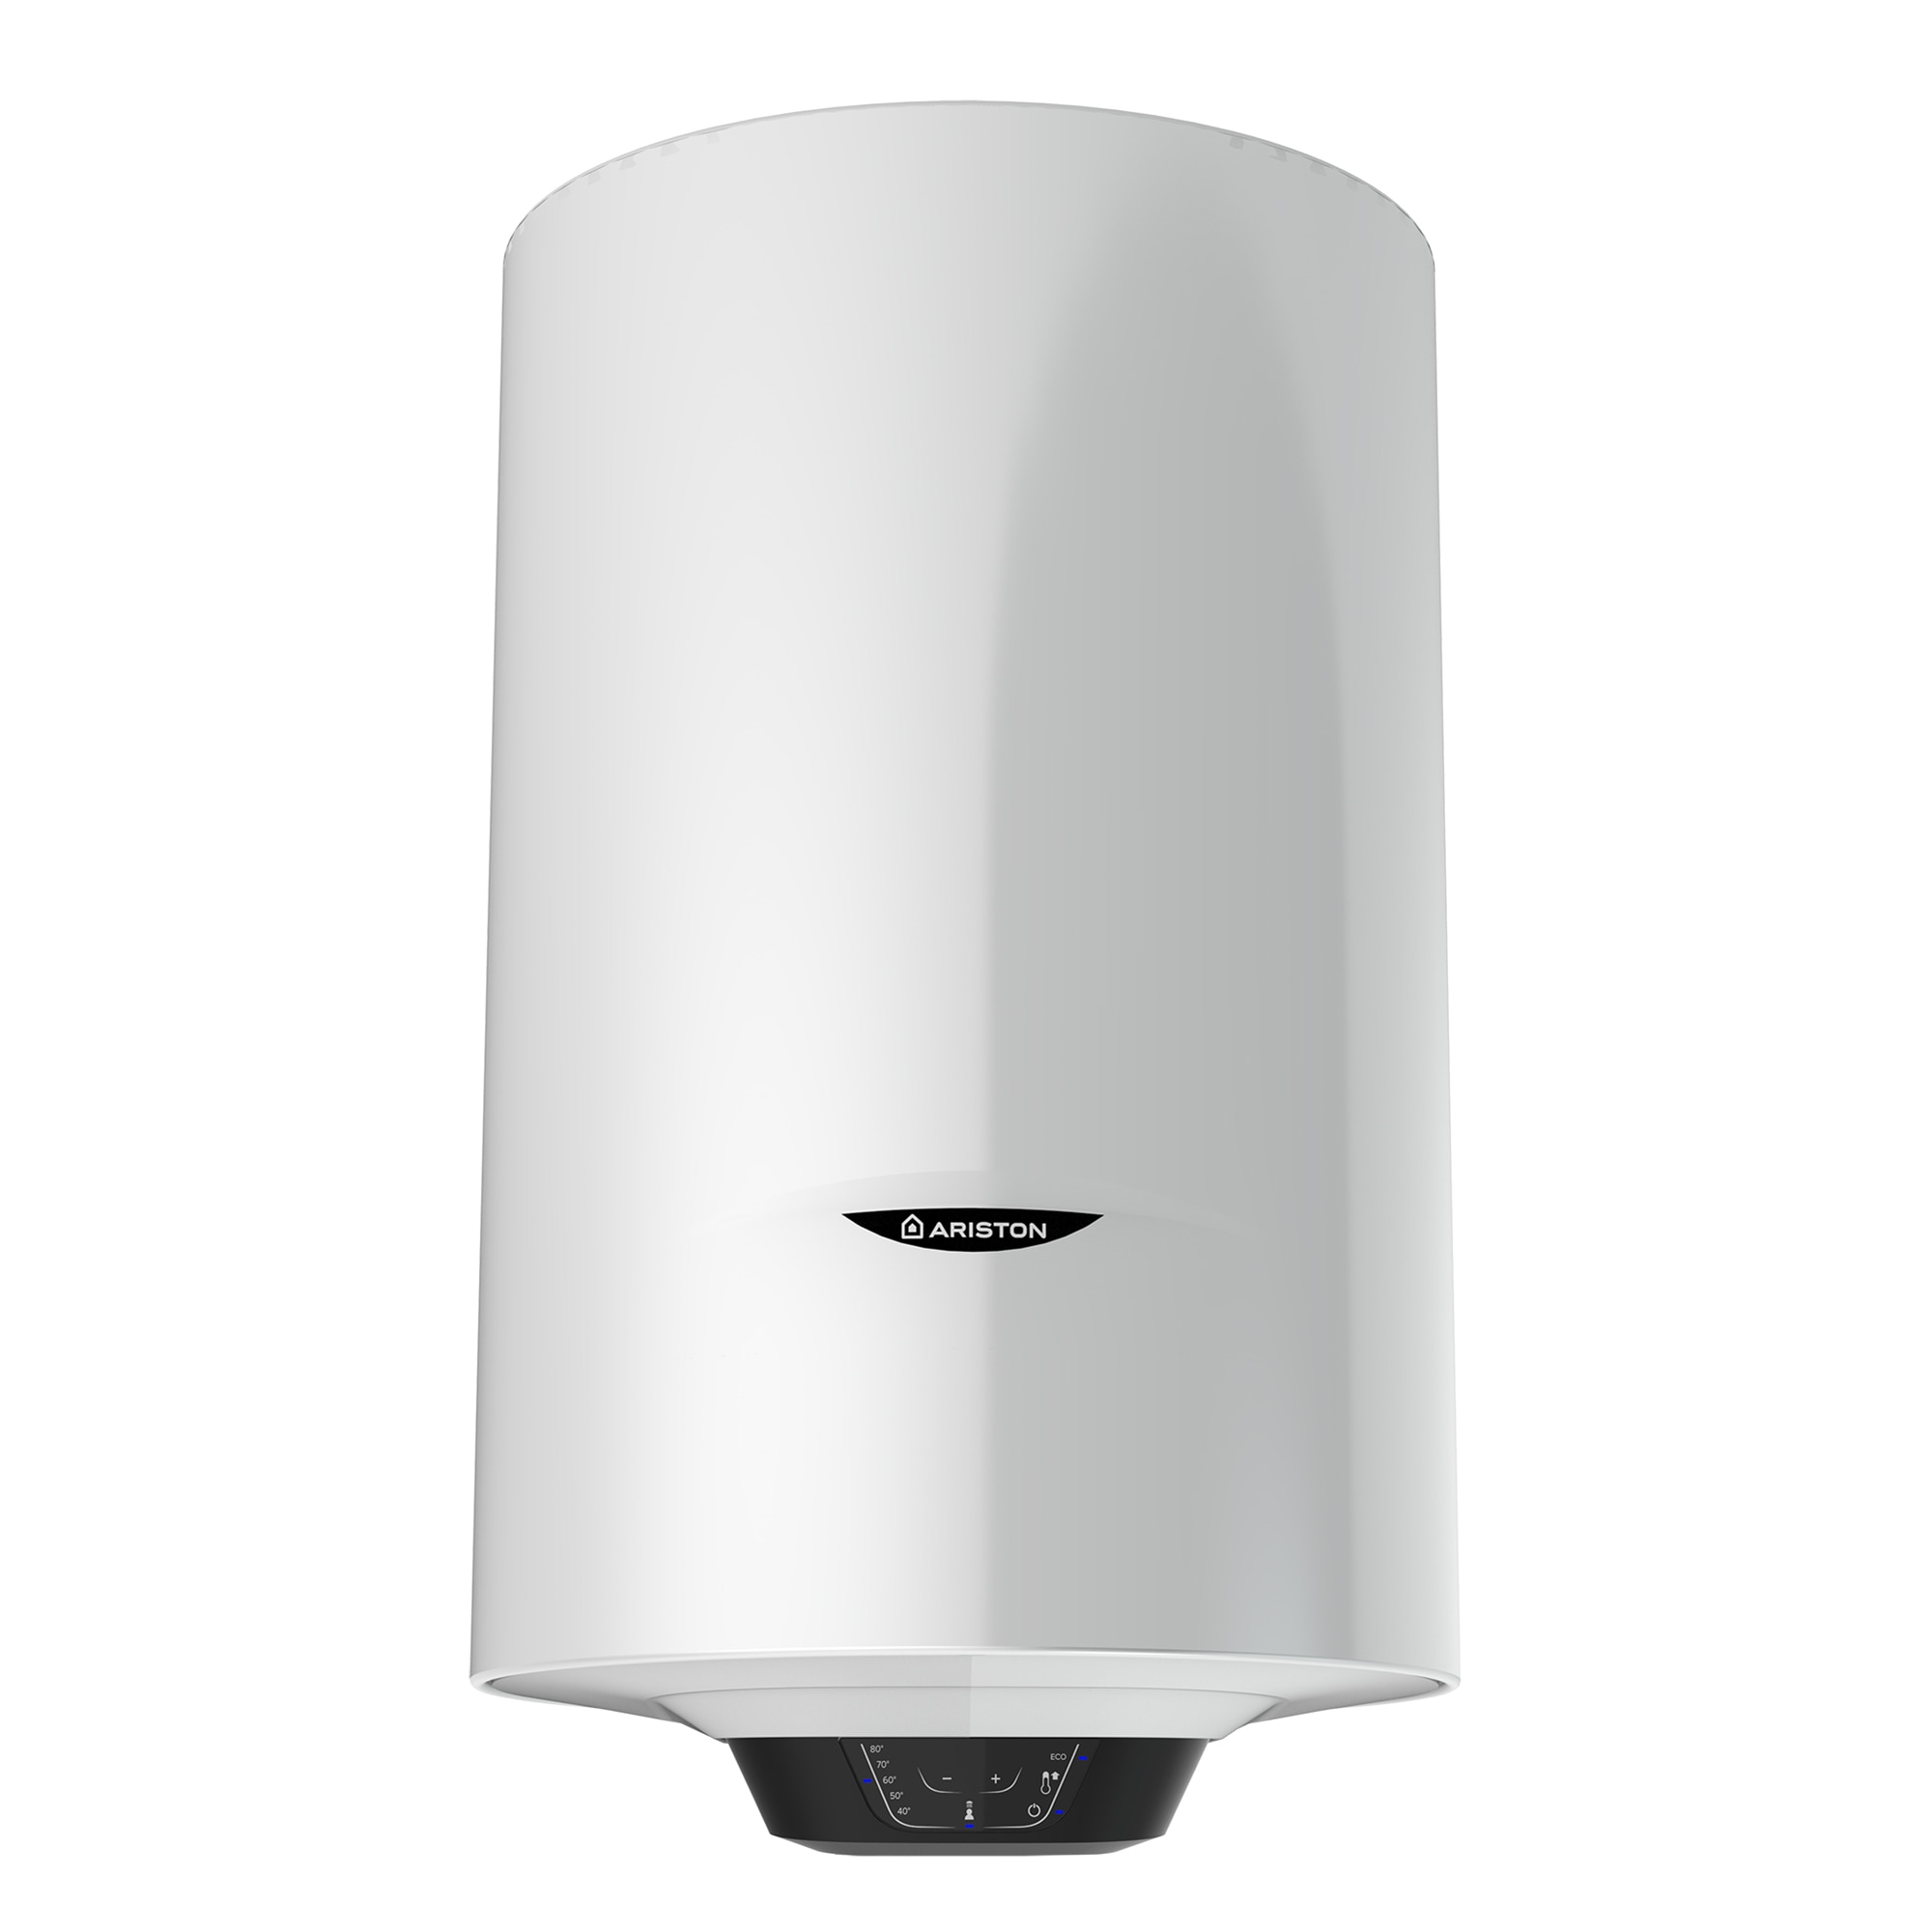 Fotografie Boiler electric Ariston Pro 1 Eco 80L, 1800 W, functie Eco Evo, rezervor emailat cu Titan